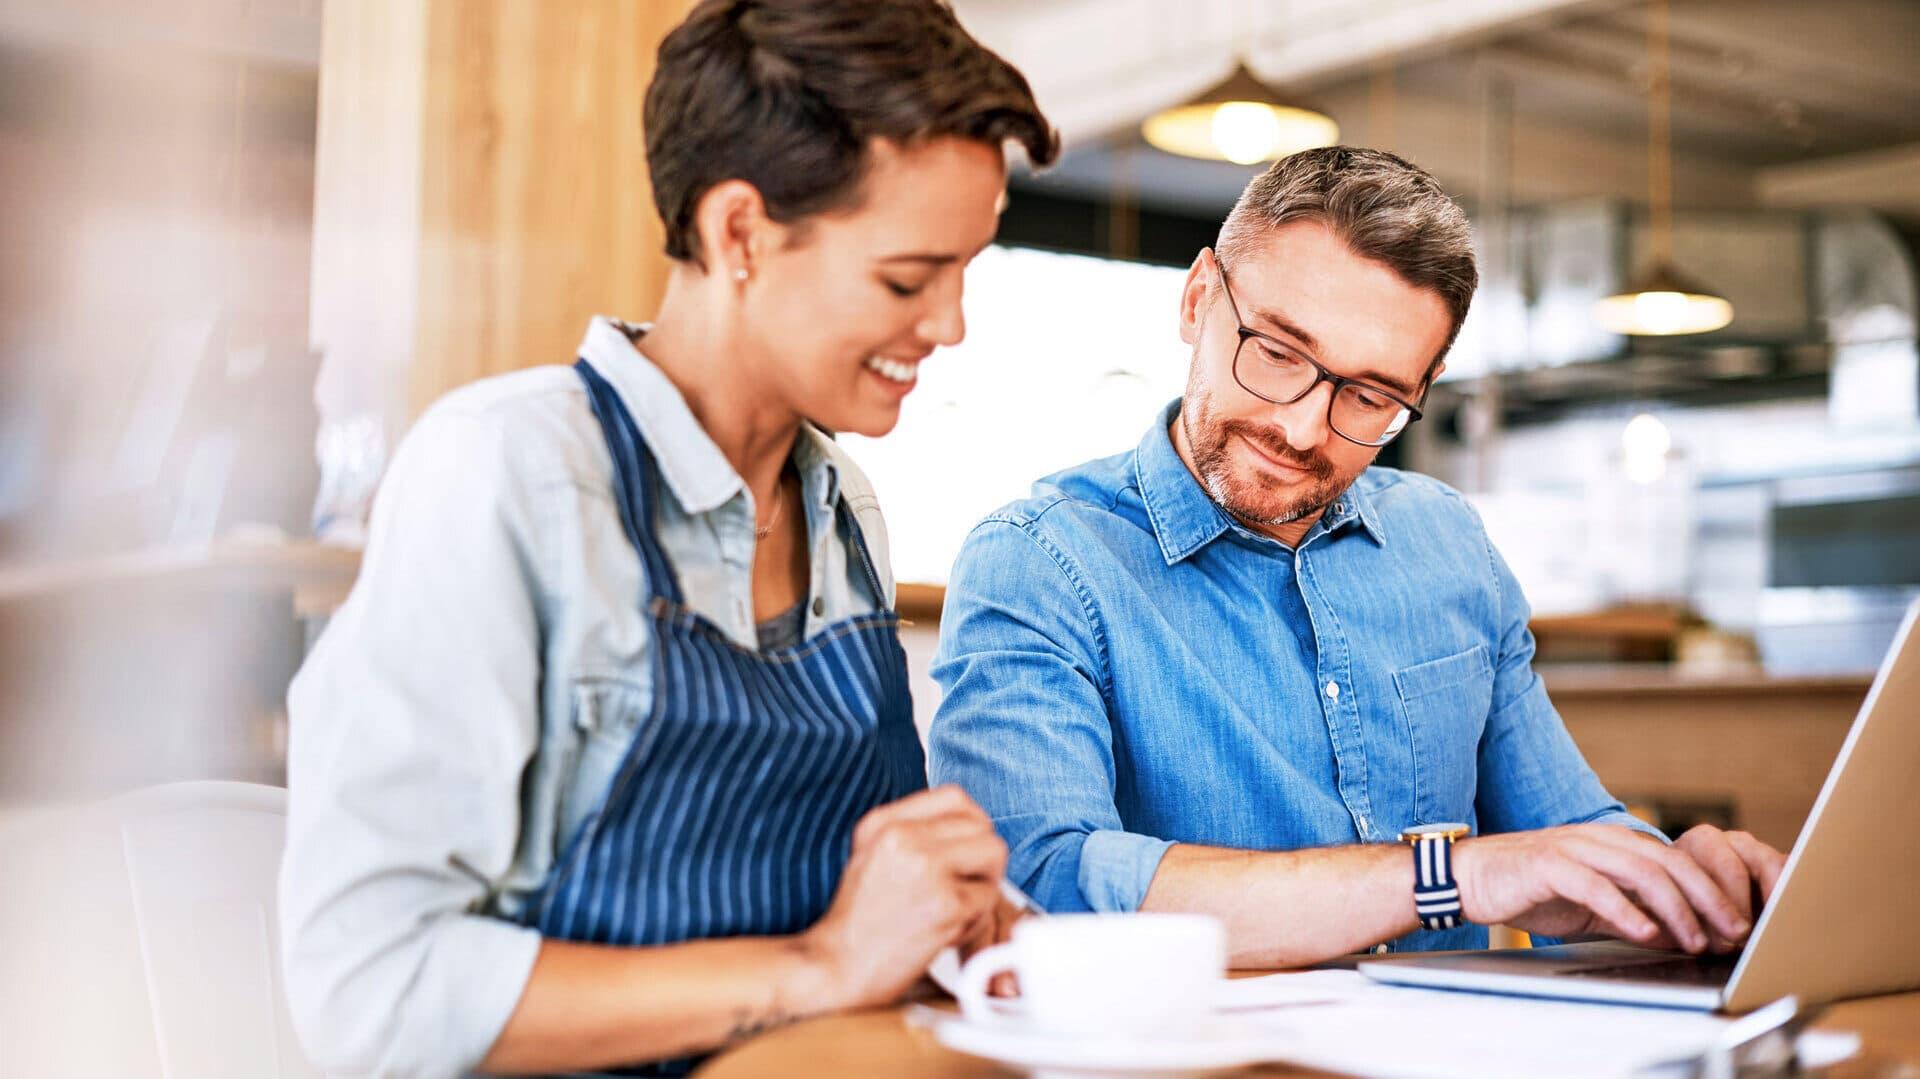 Zwei Personen sitzen bei Kaffee gemeinsam am Computer